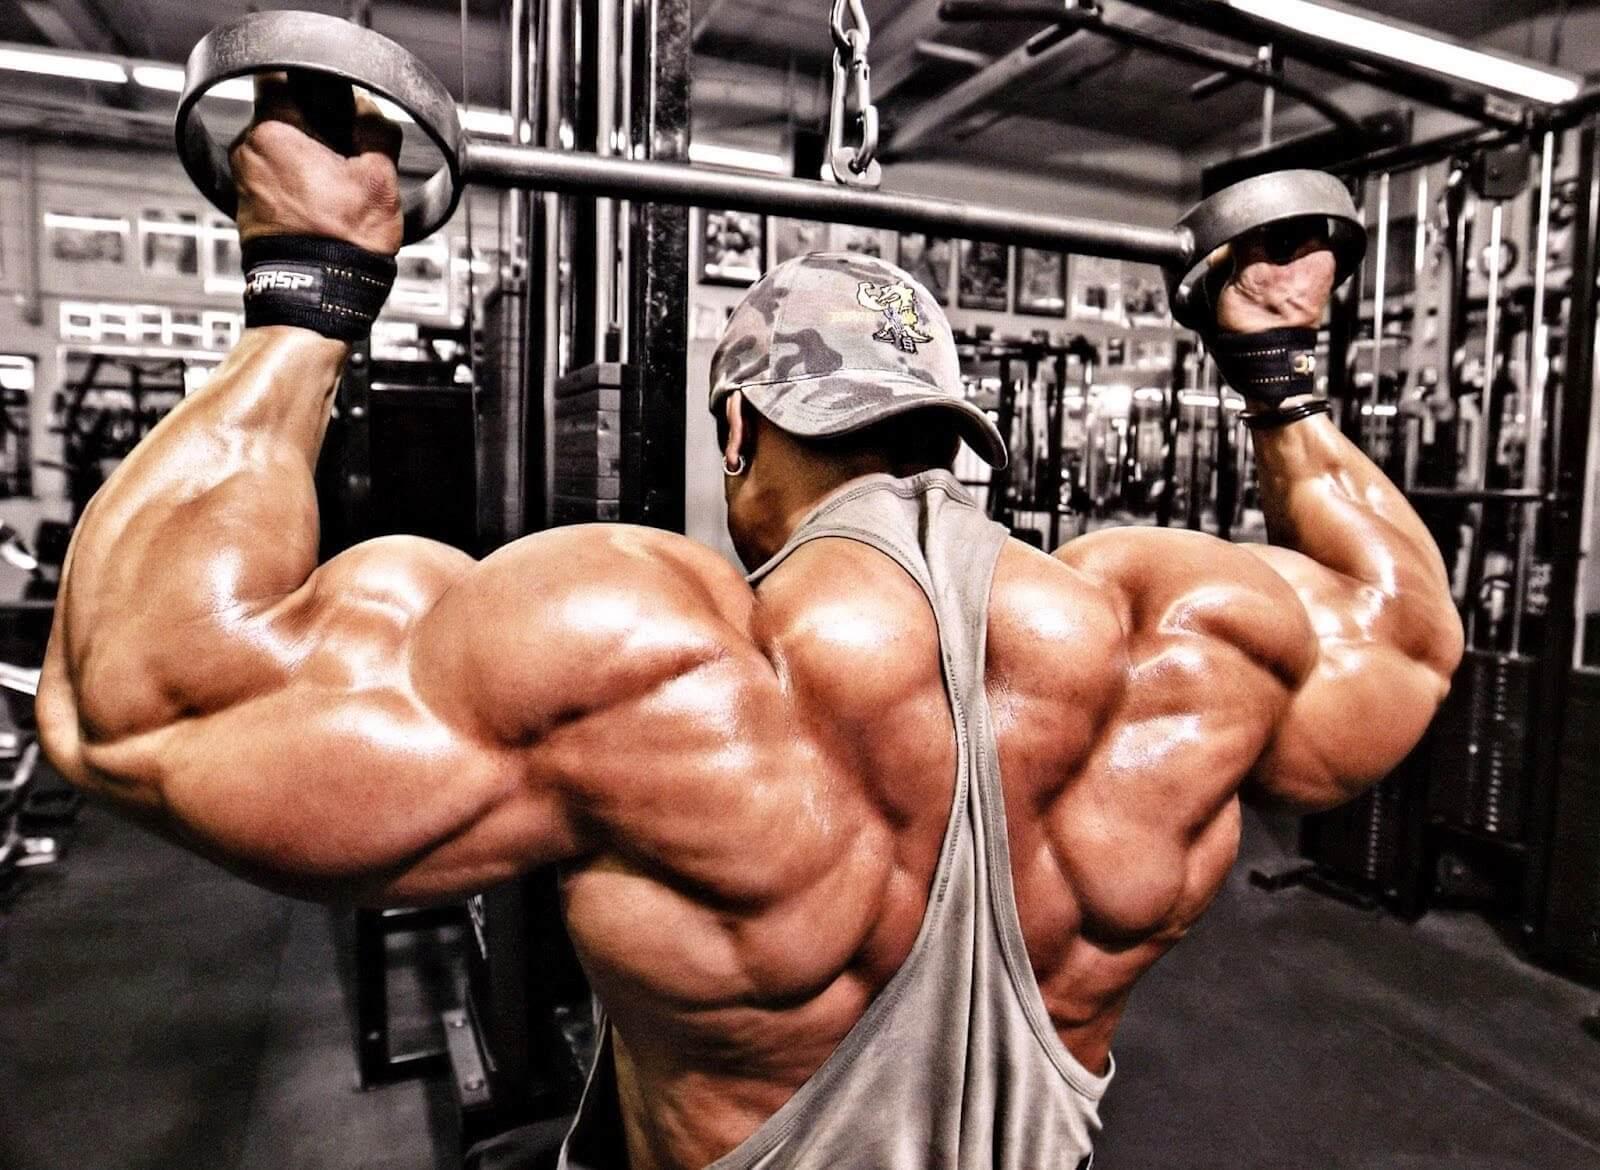 картинки мышцами бодибилдинга количеству